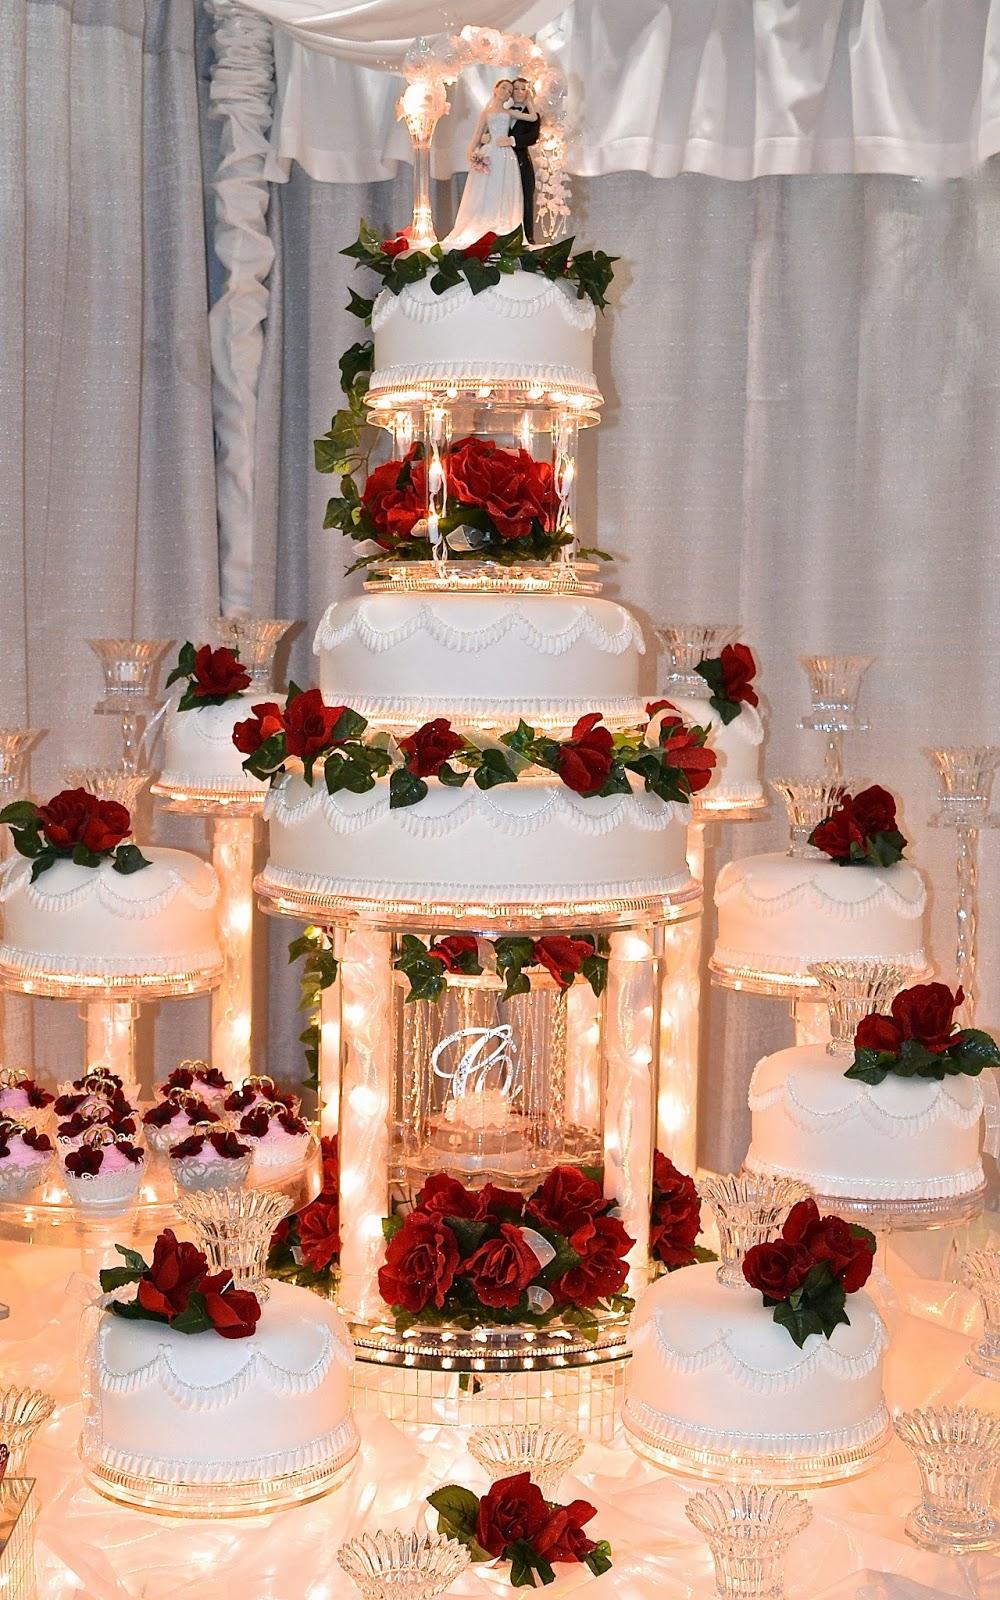 Best 25 Modern Bungalow Exterior Ideas On Pinterest: Is Gluten Your Kryptonite?: WEDDING CAKE TRENDS 2014